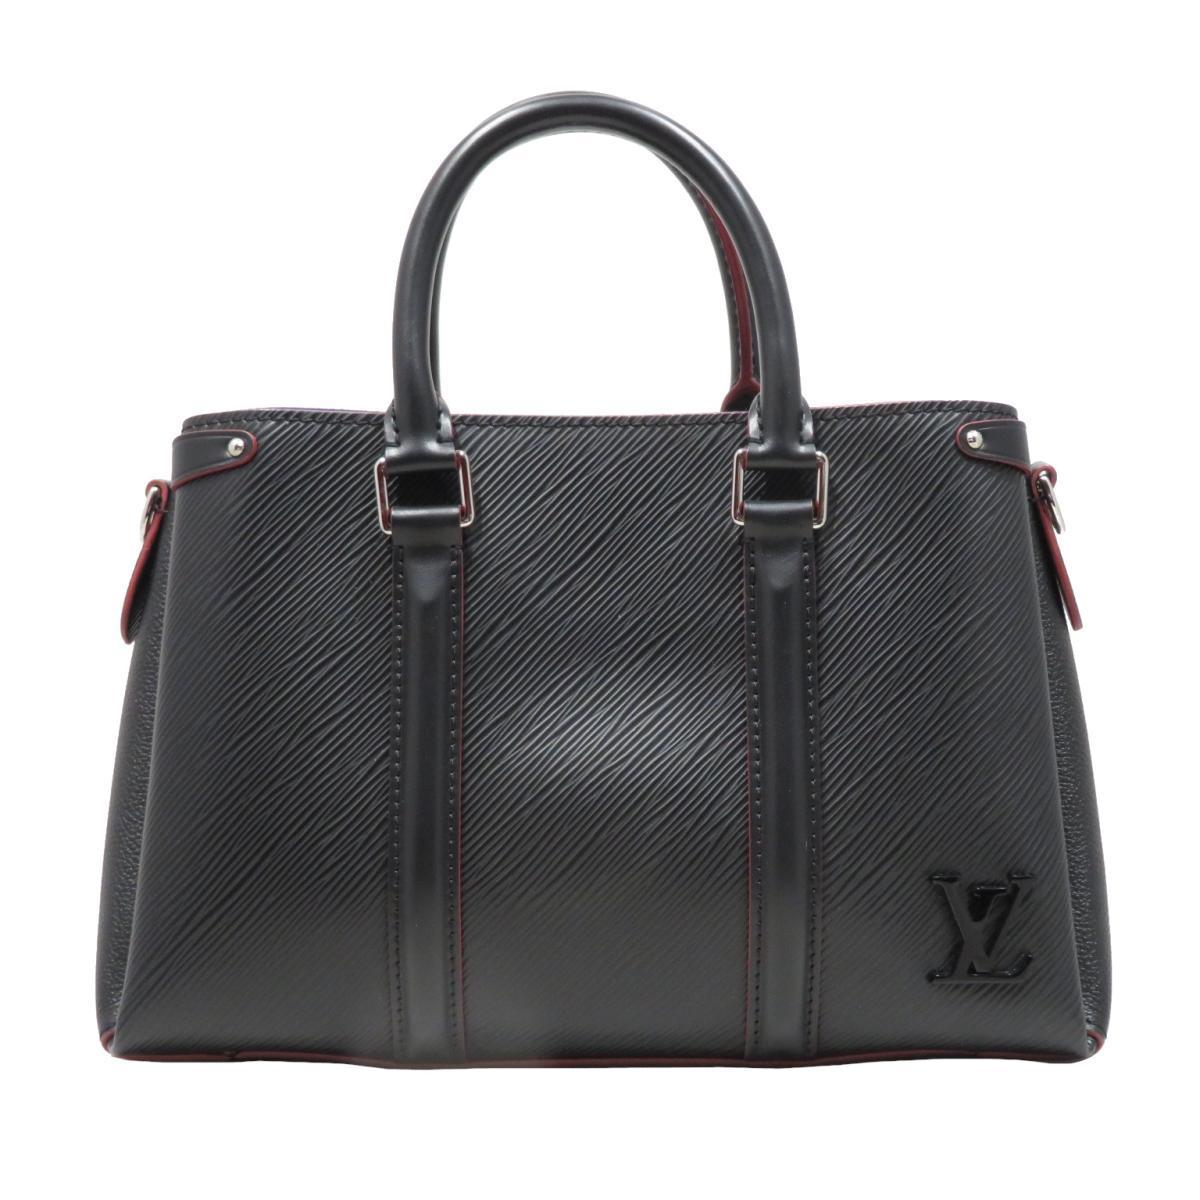 LOUIS VUITTON Sufro NV BB Handbag Ladies Black Noir Epi Leather (M55613)